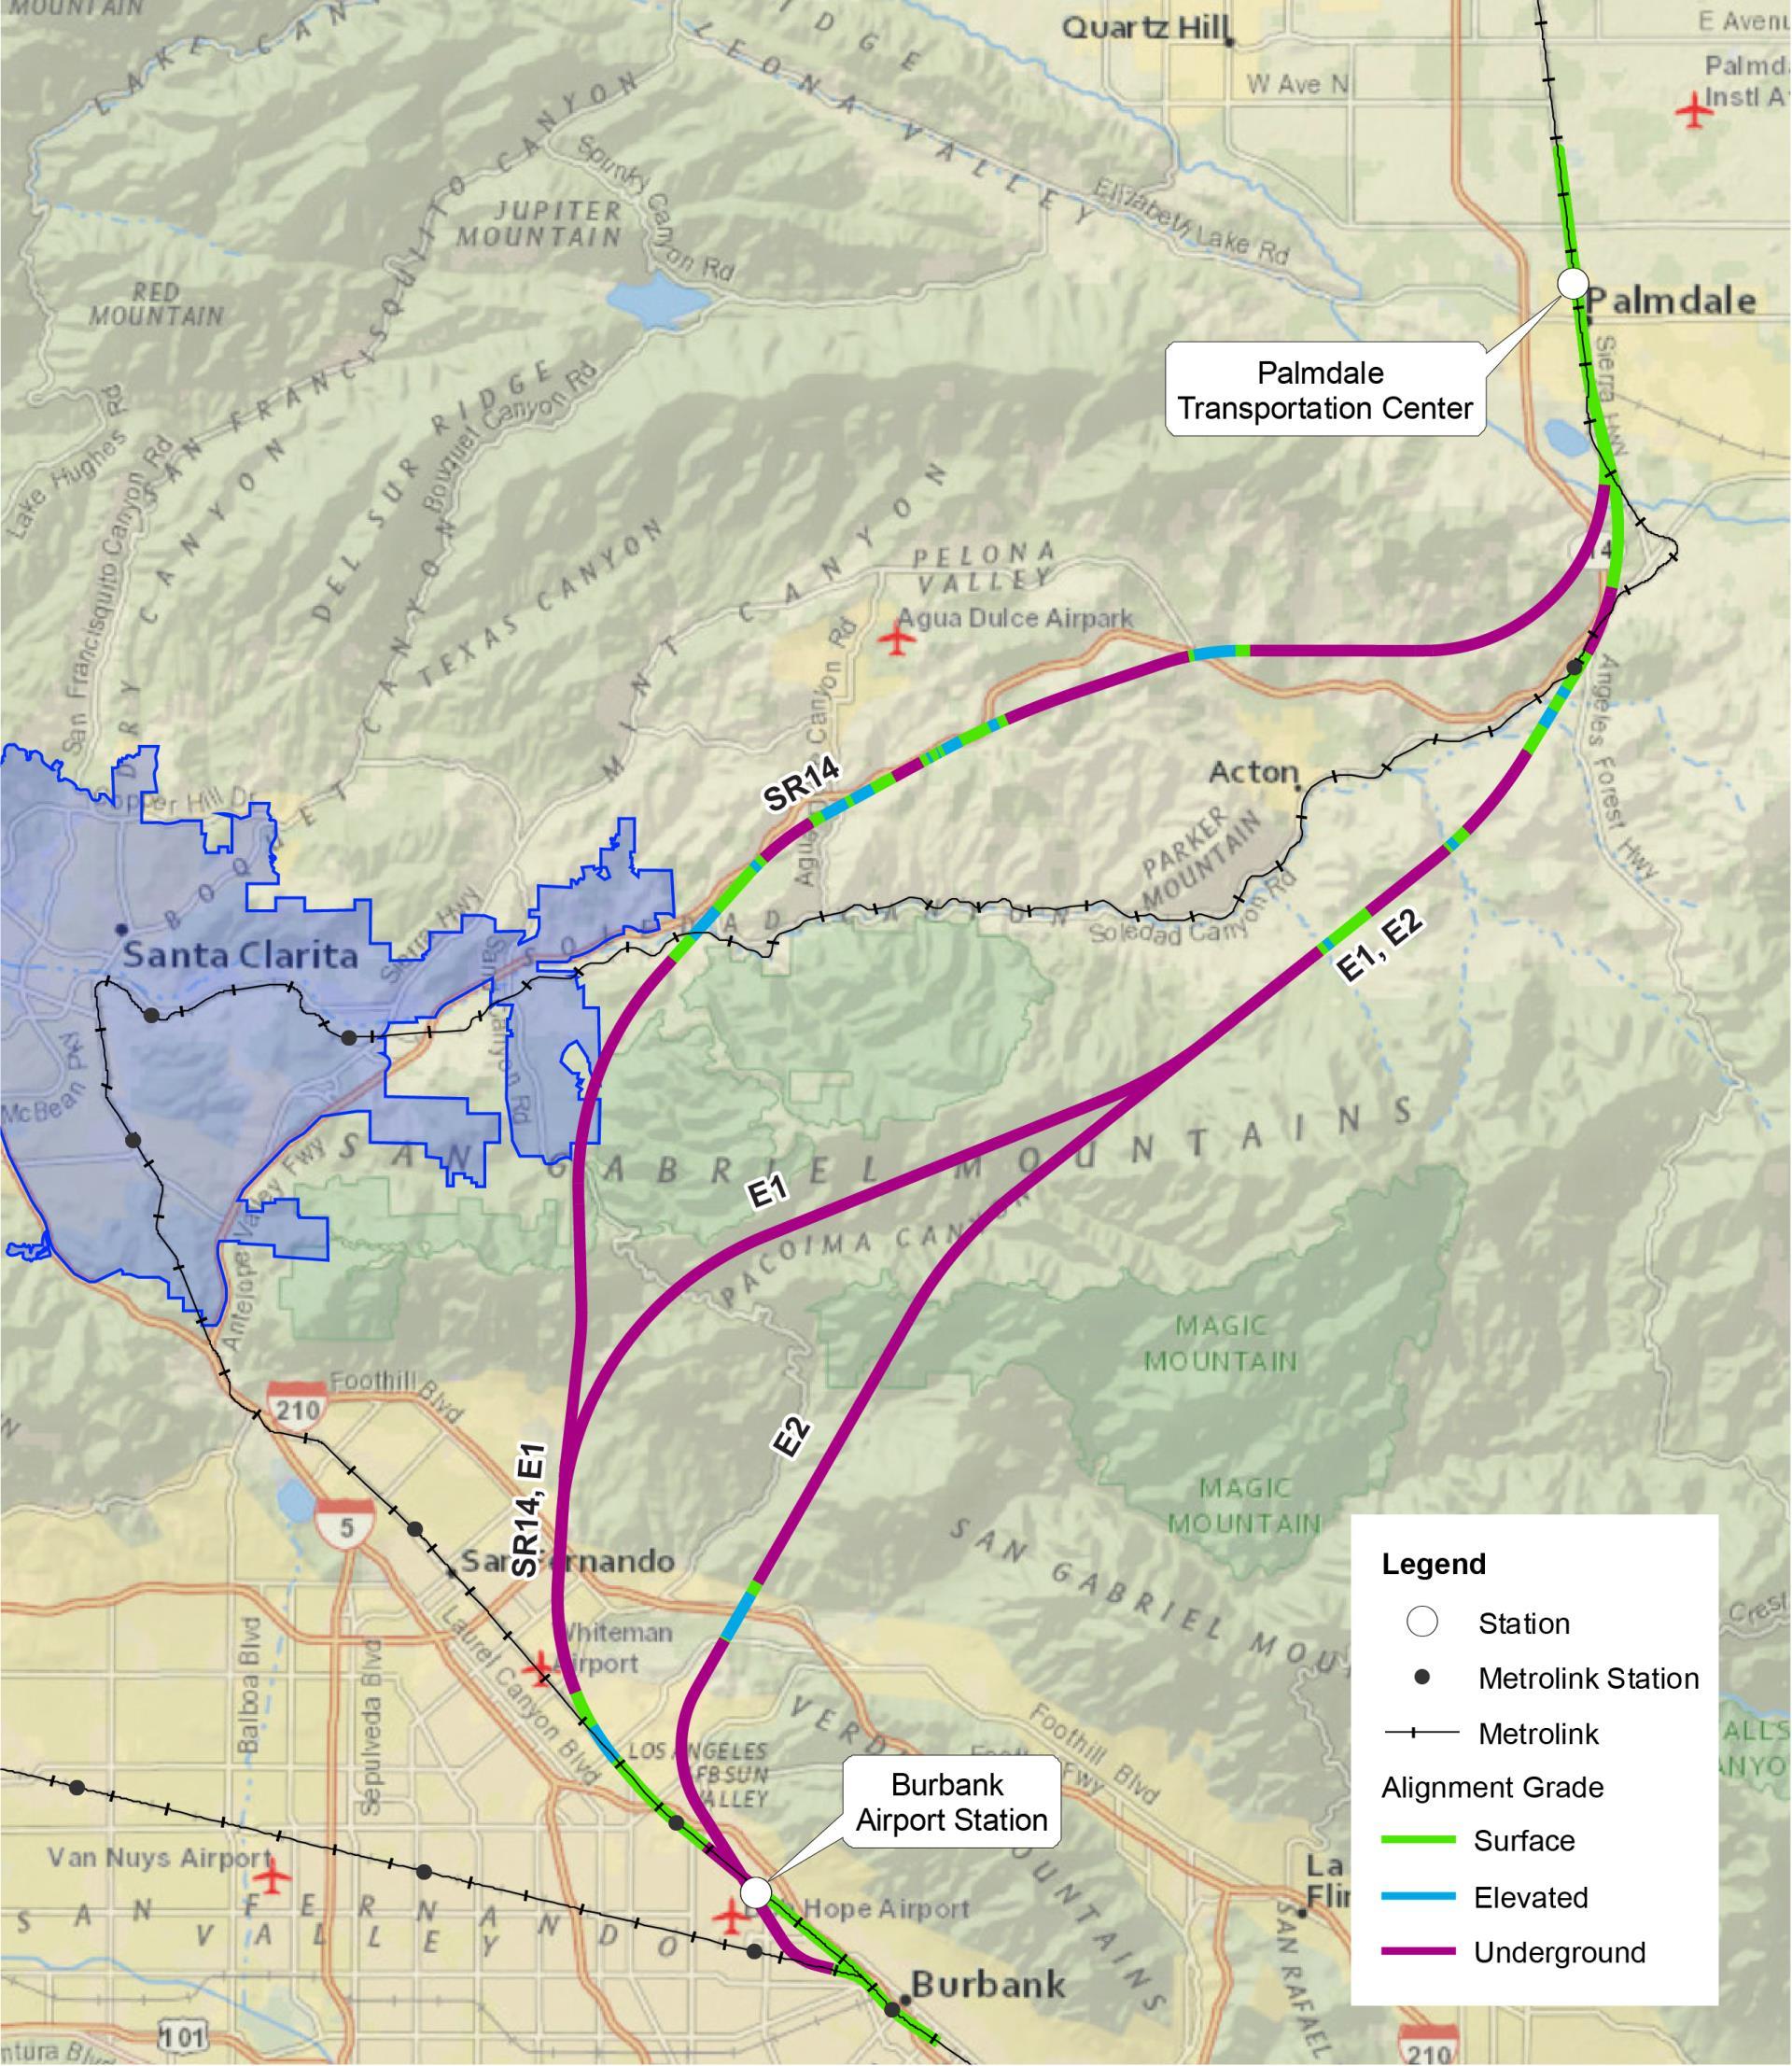 California HighSpeed Rail City Of Santa Clarita CA - High speed rail us map